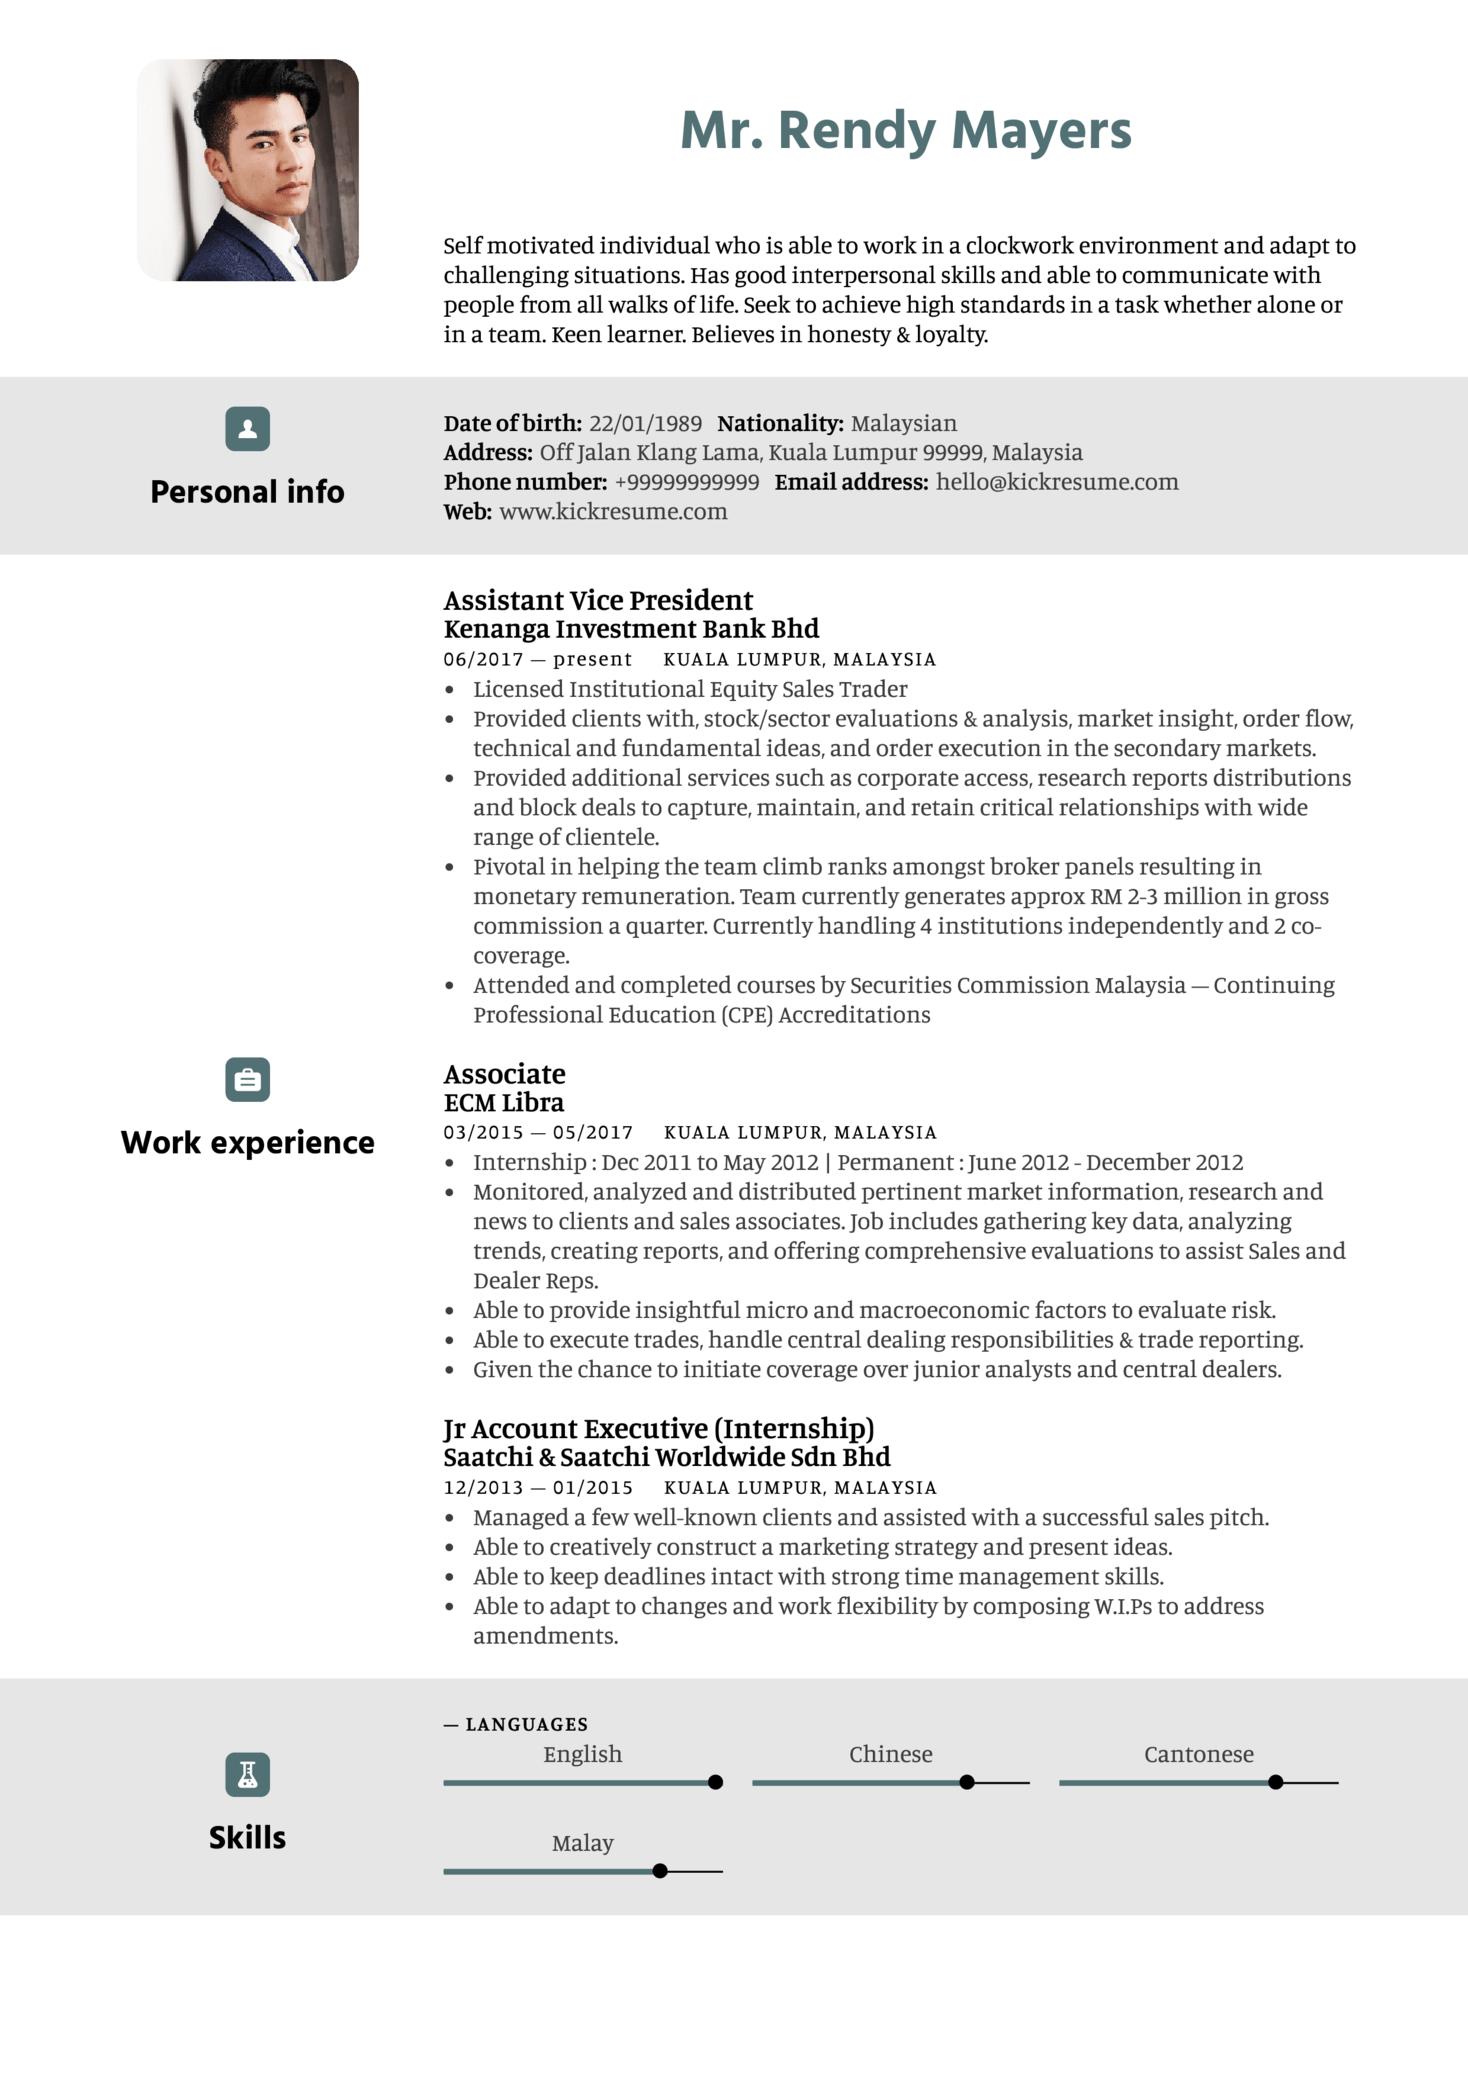 Kenanga Assistant Vice President Resume Sample (Part 1)